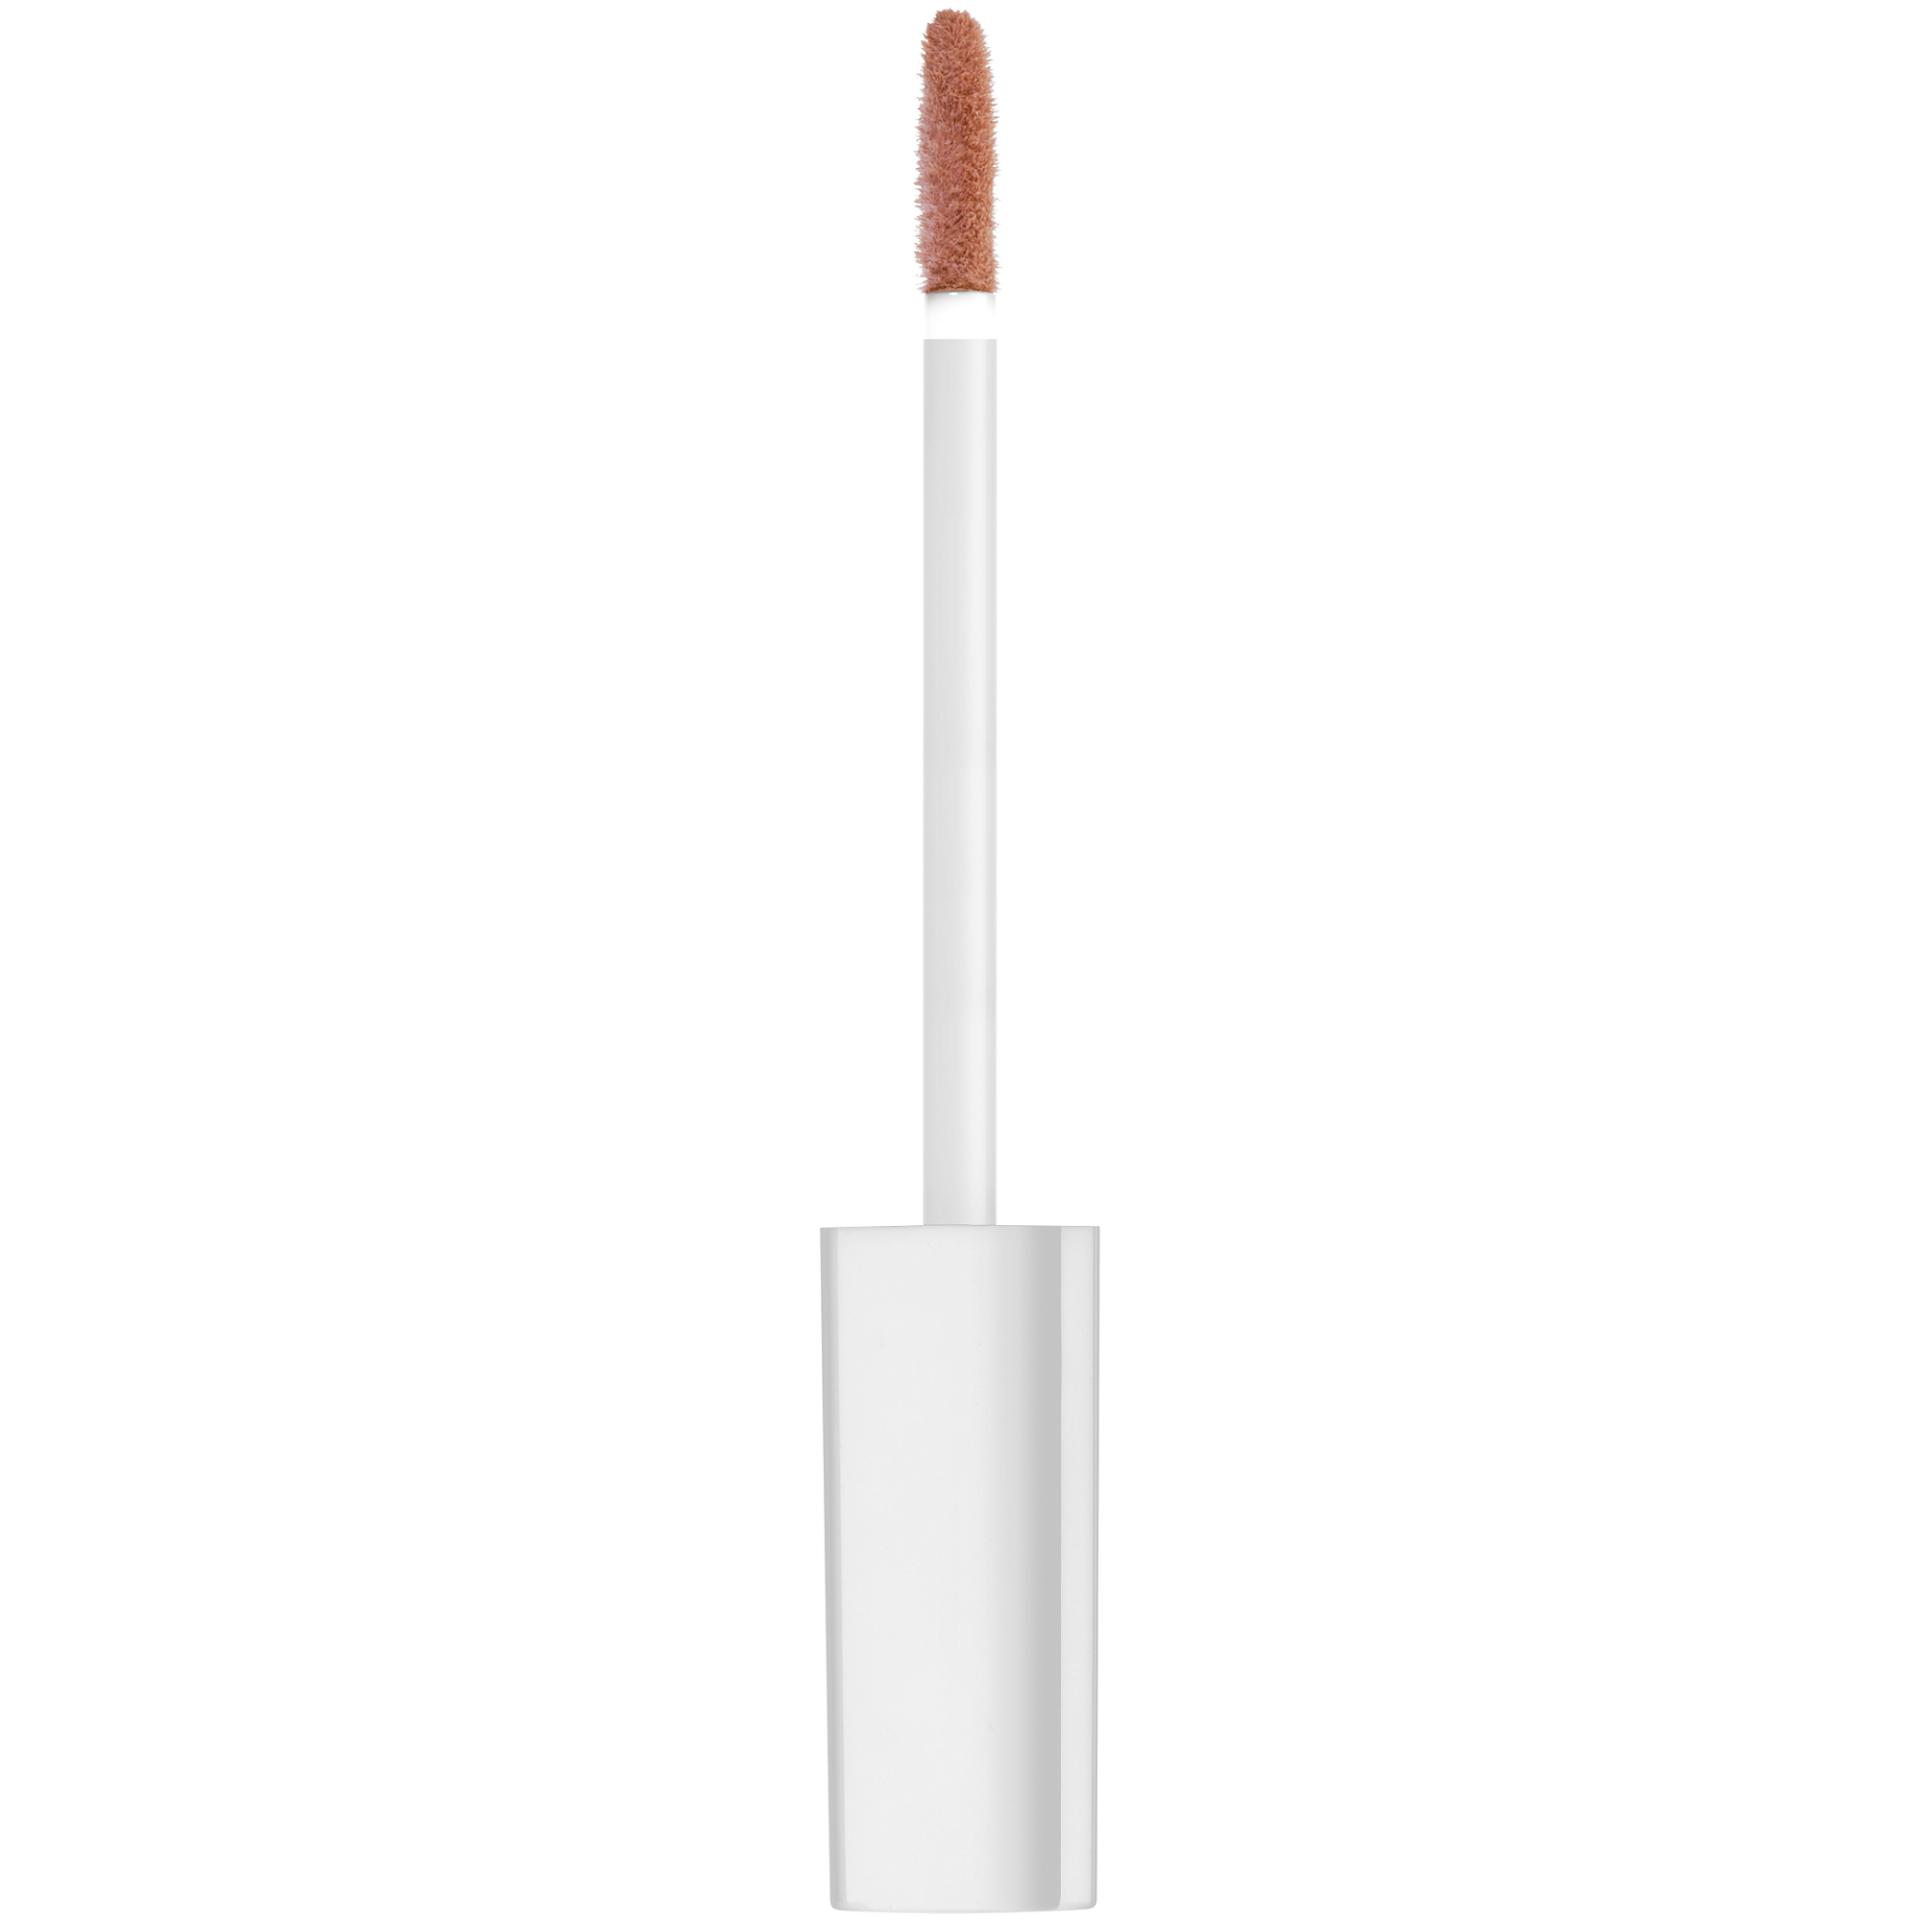 Nyx Professional Makeup Lingerie Liquid Lipstick 17 Seduction Aura Beauty Lipmatte Aries Best Seller Matte Lipstik 19 Dusk To Dawn Long